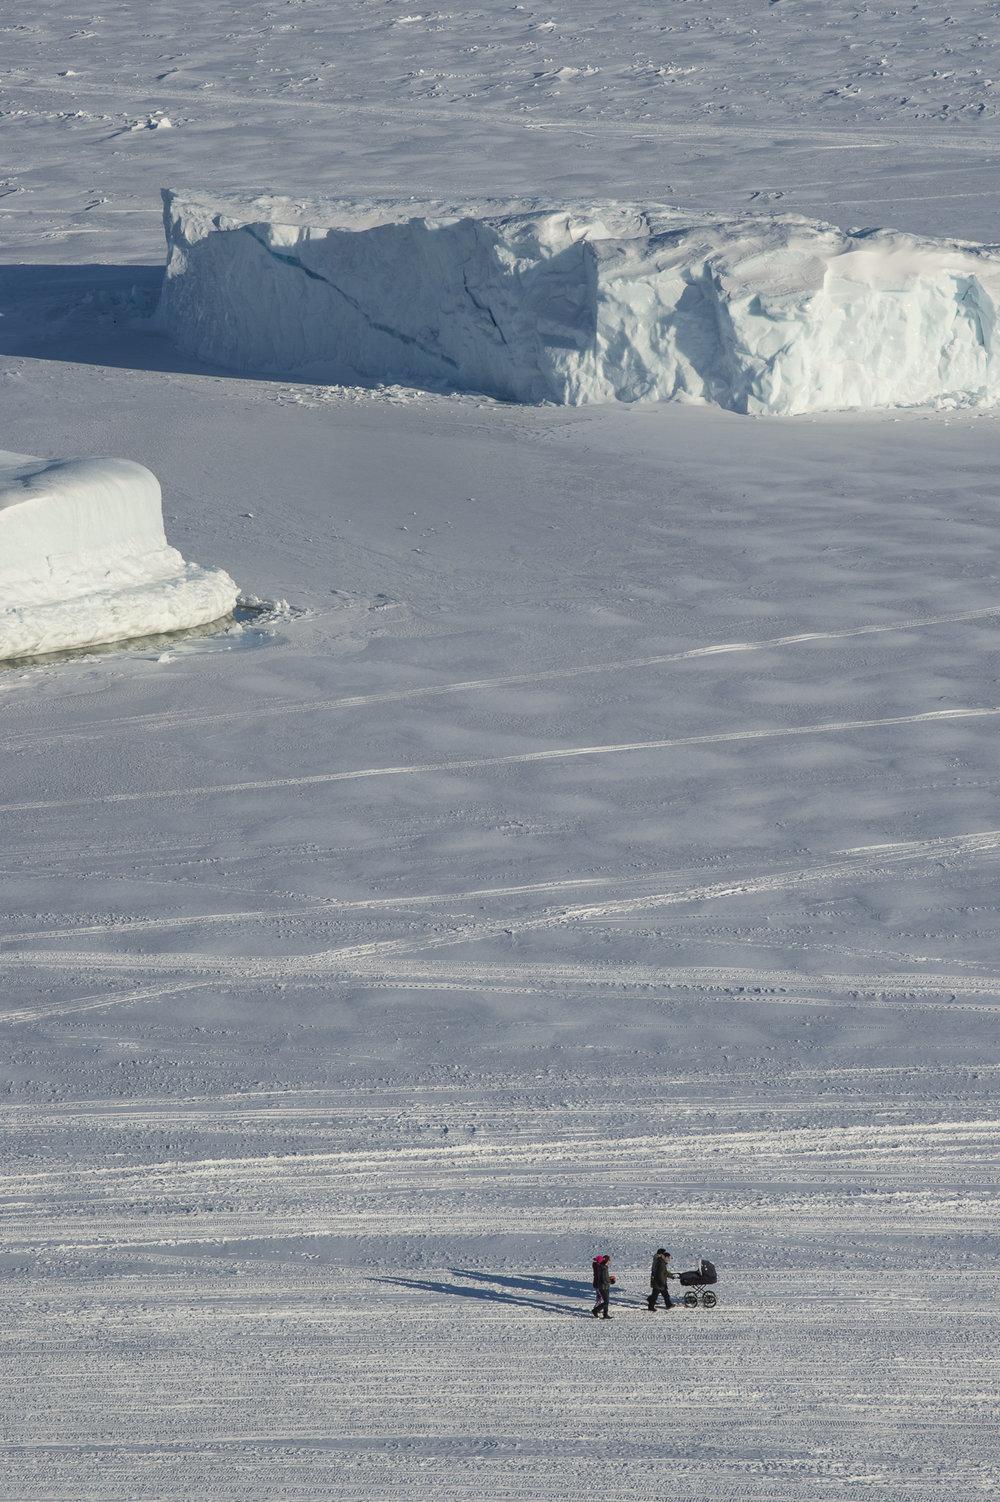 13.Defibaugh_Greenland_Uummannaq_a_37.jpg